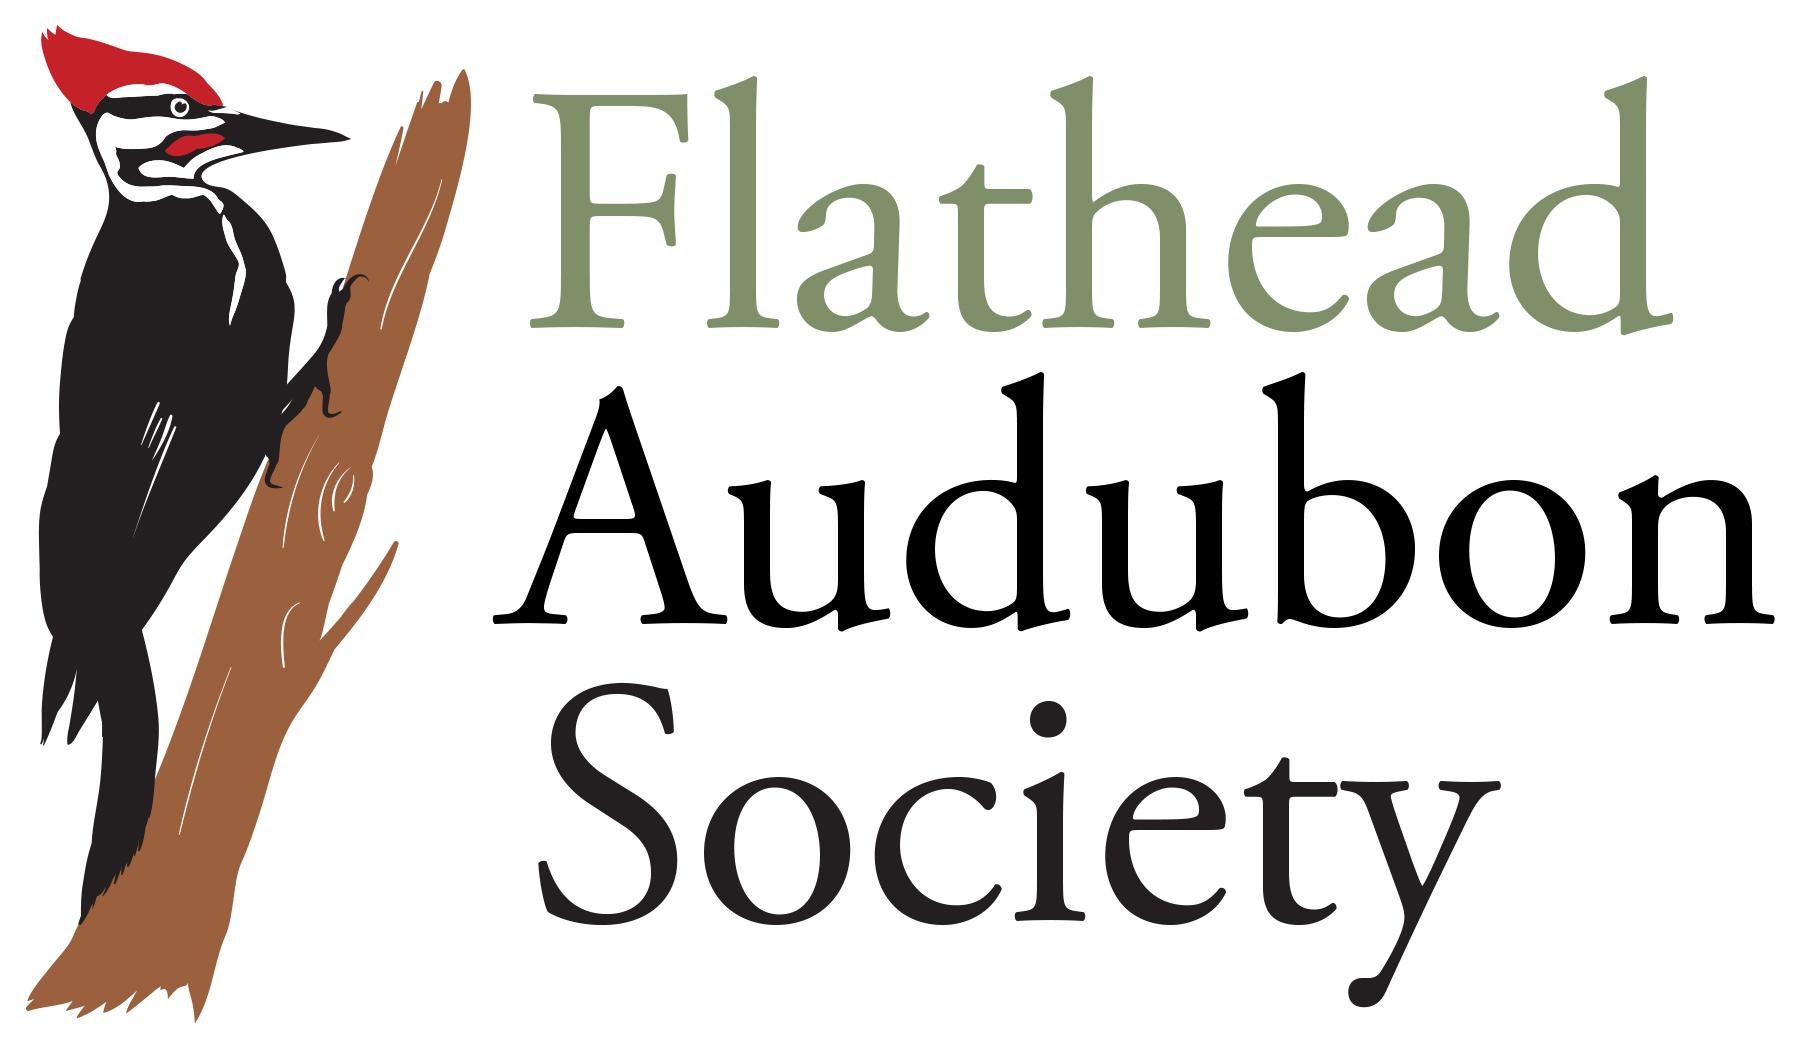 Flathead Audubon Society